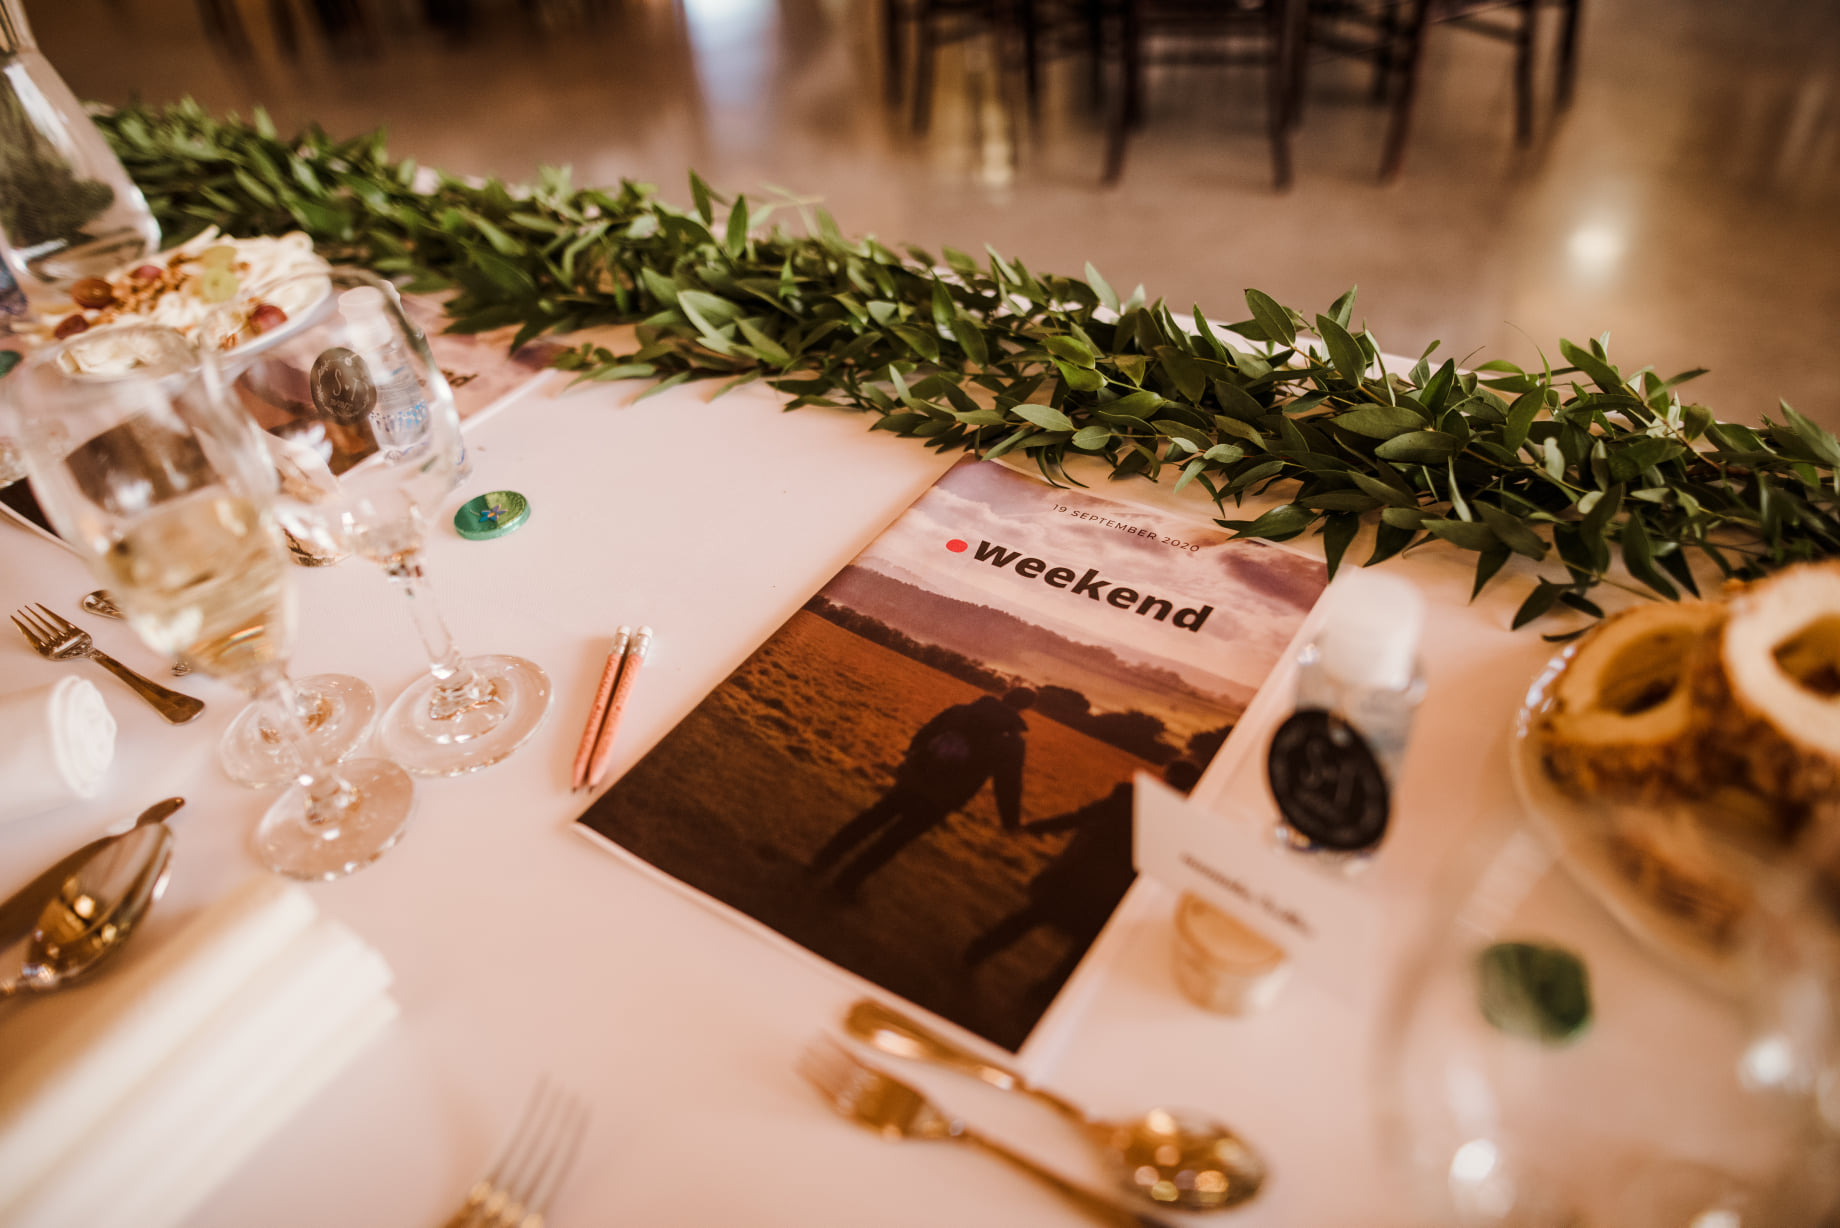 svadba-wedding-liptovjpg